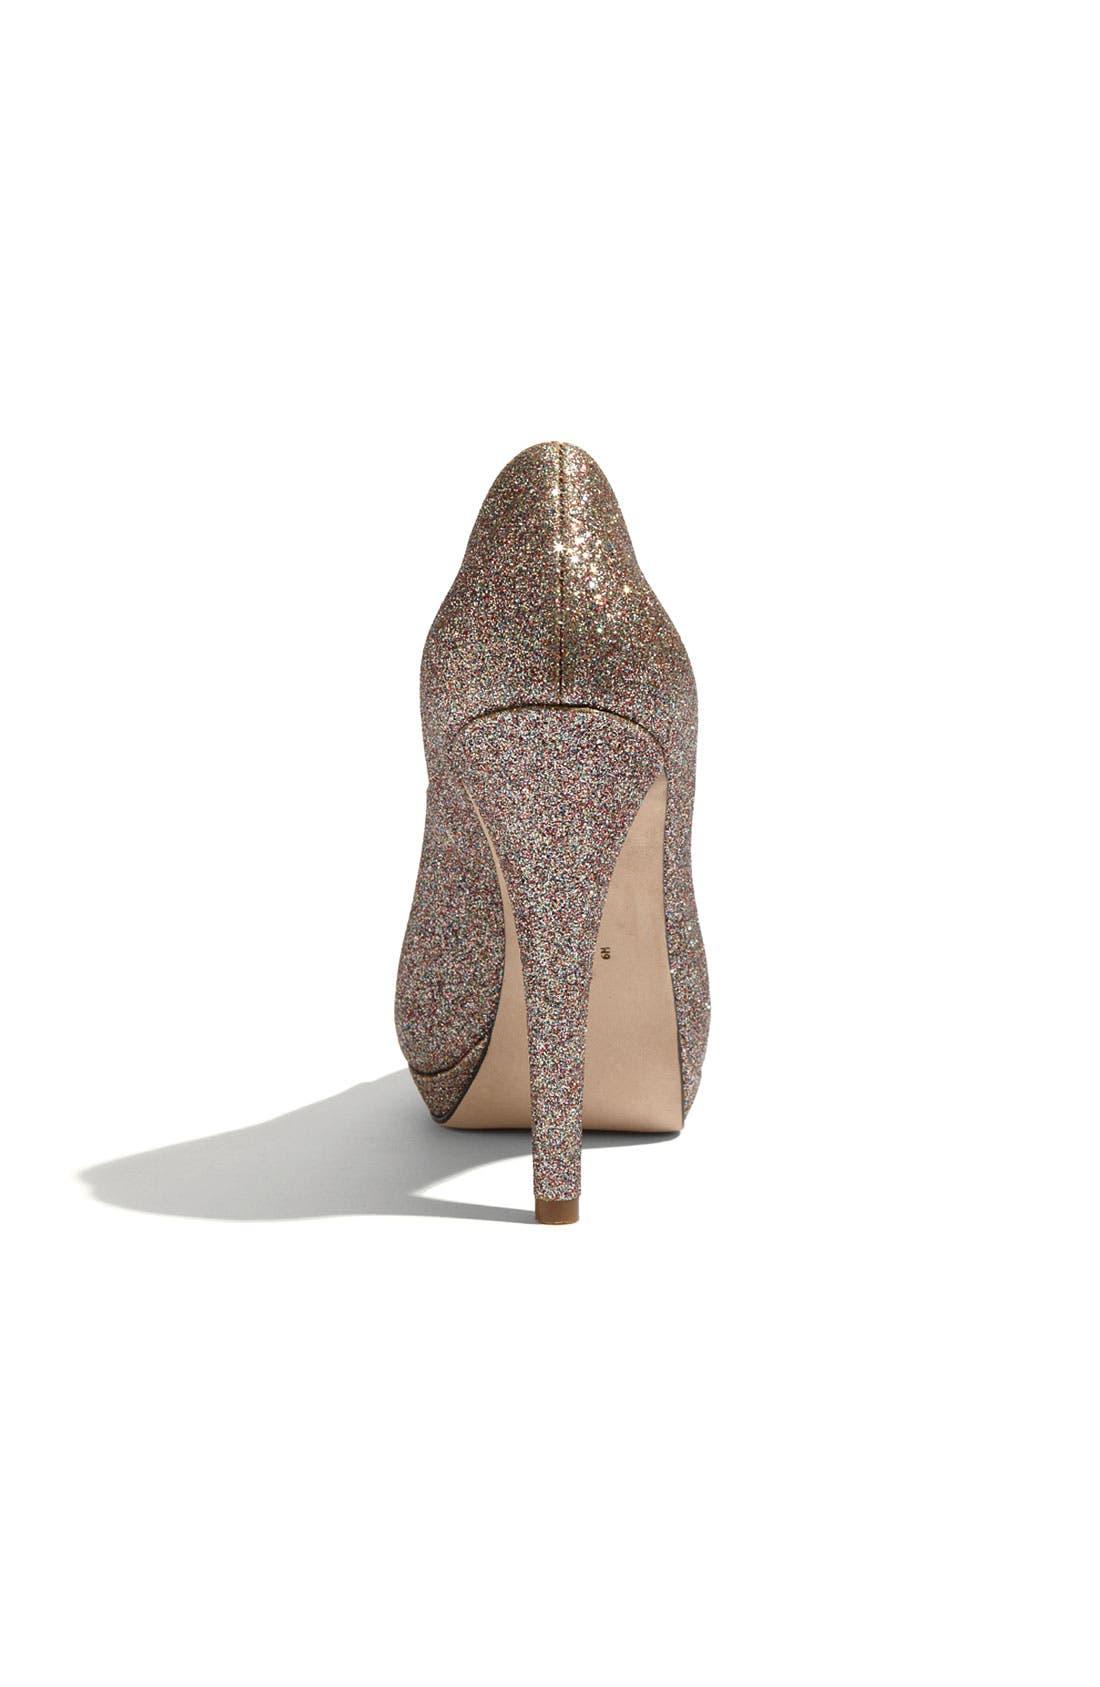 Footwear 'Selima' Peep Toe Pump,                             Alternate thumbnail 17, color,